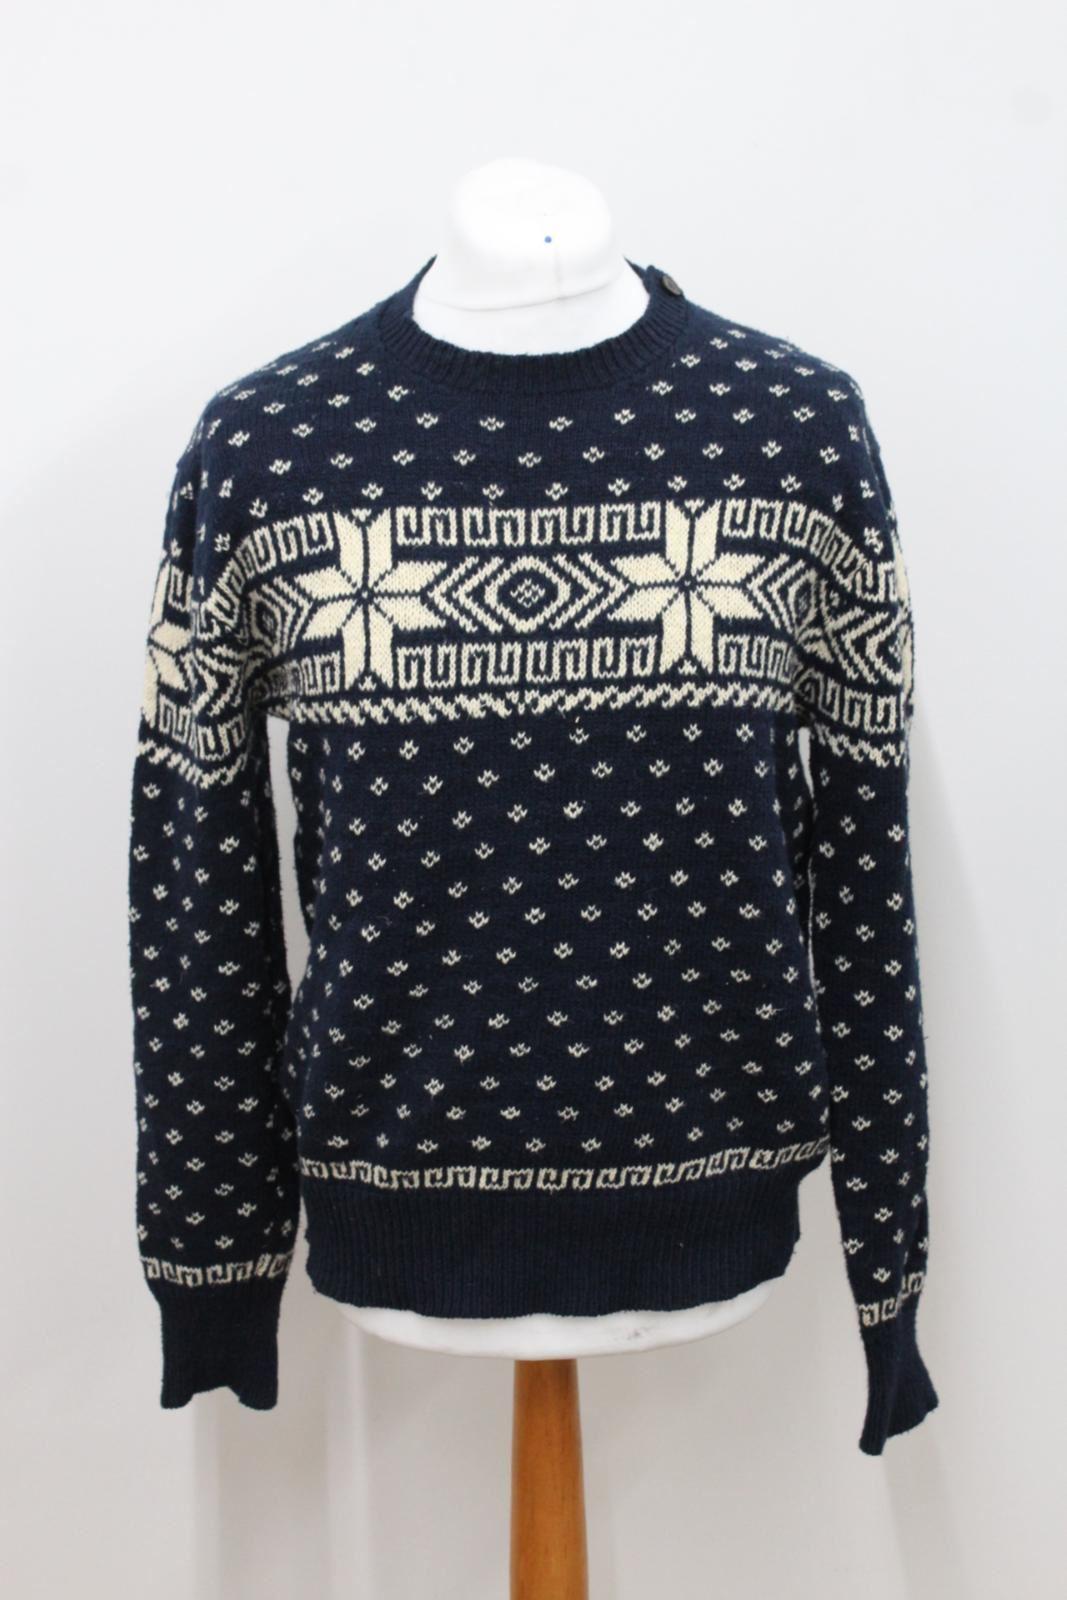 POLO-RALPH-LAUREN-Men-039-s-Navy-amp-Cream-Cotton-Blend-Knitted-Jumper-Size-M